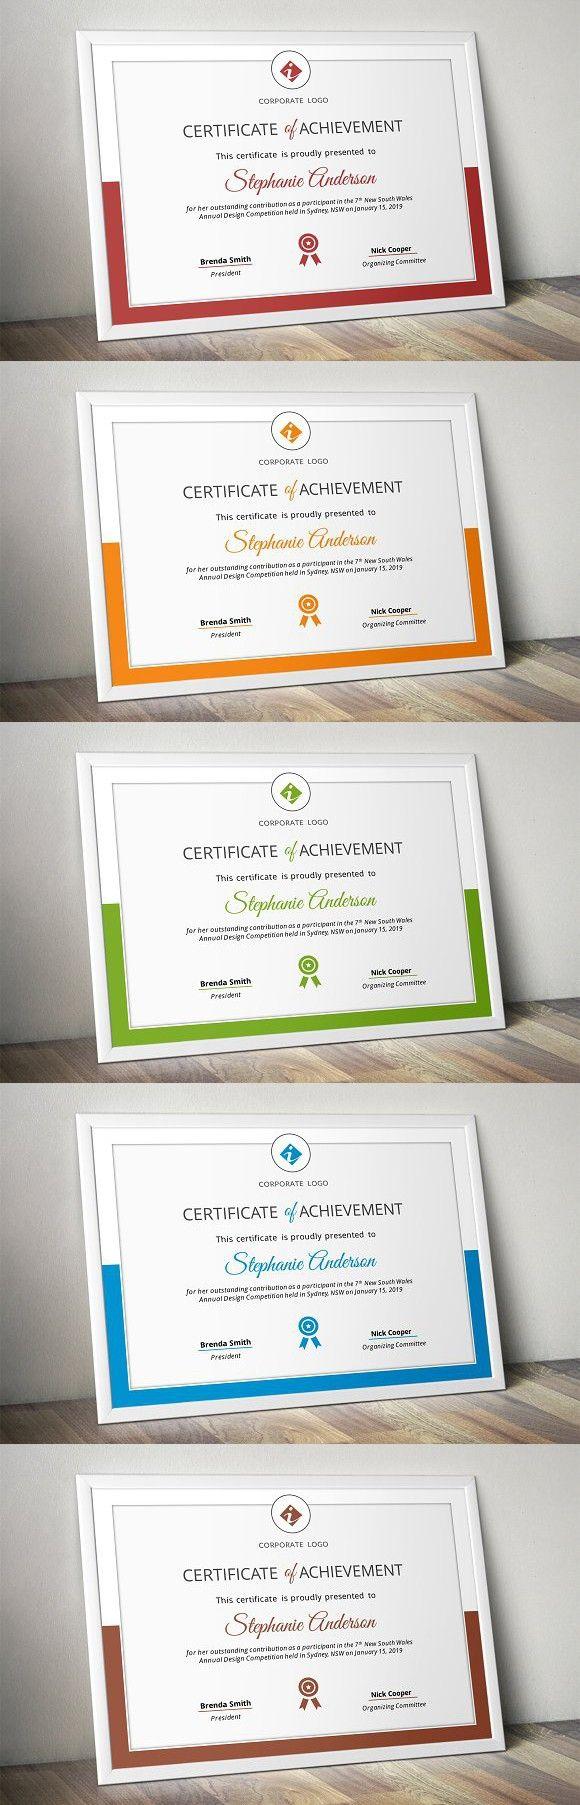 12 best training participation certificate images on Pinterest